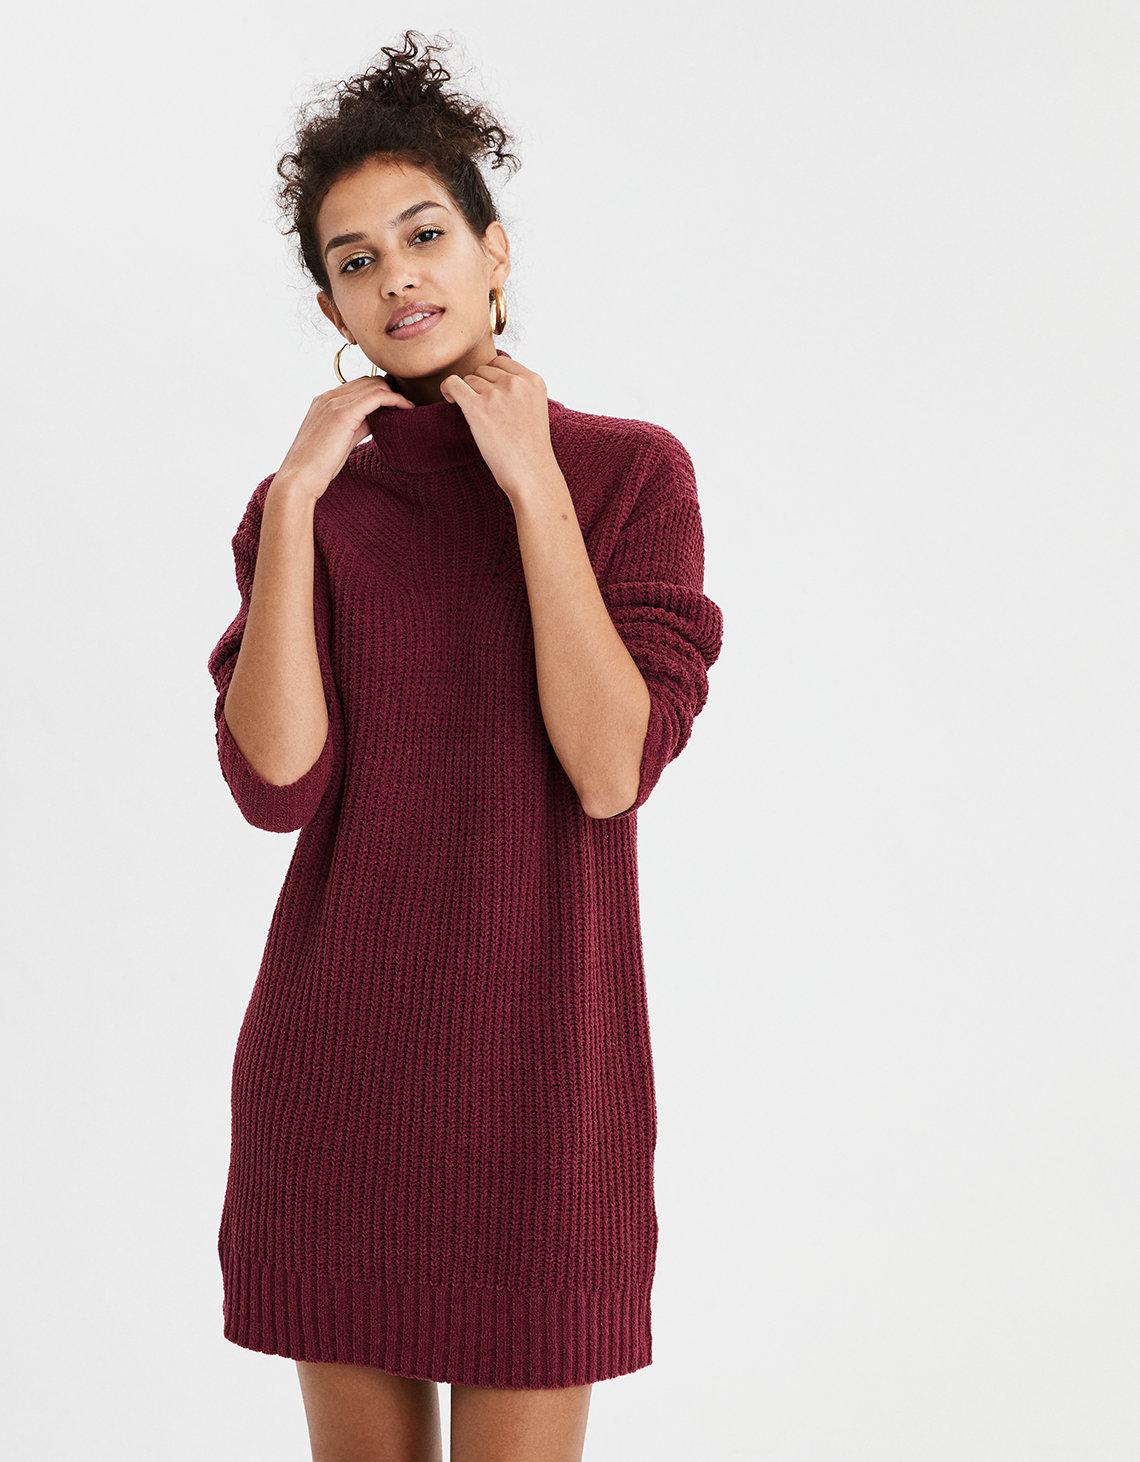 to wear - Sweater Neck dress video